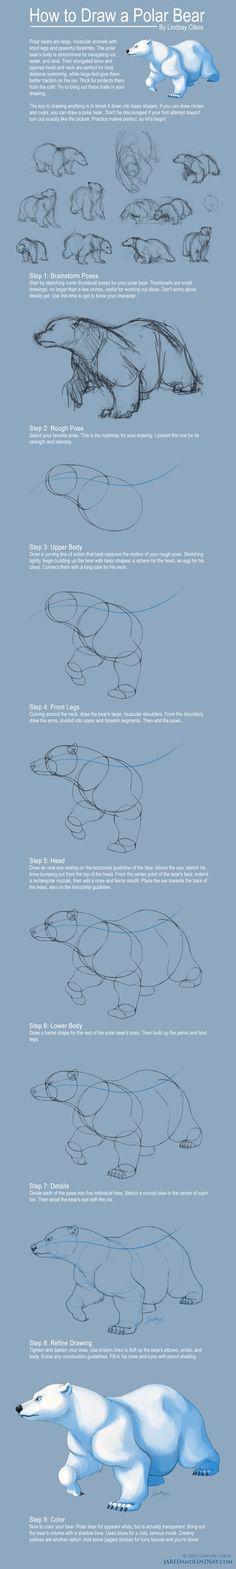 drawing tips - クマの描き方 Polar Bear